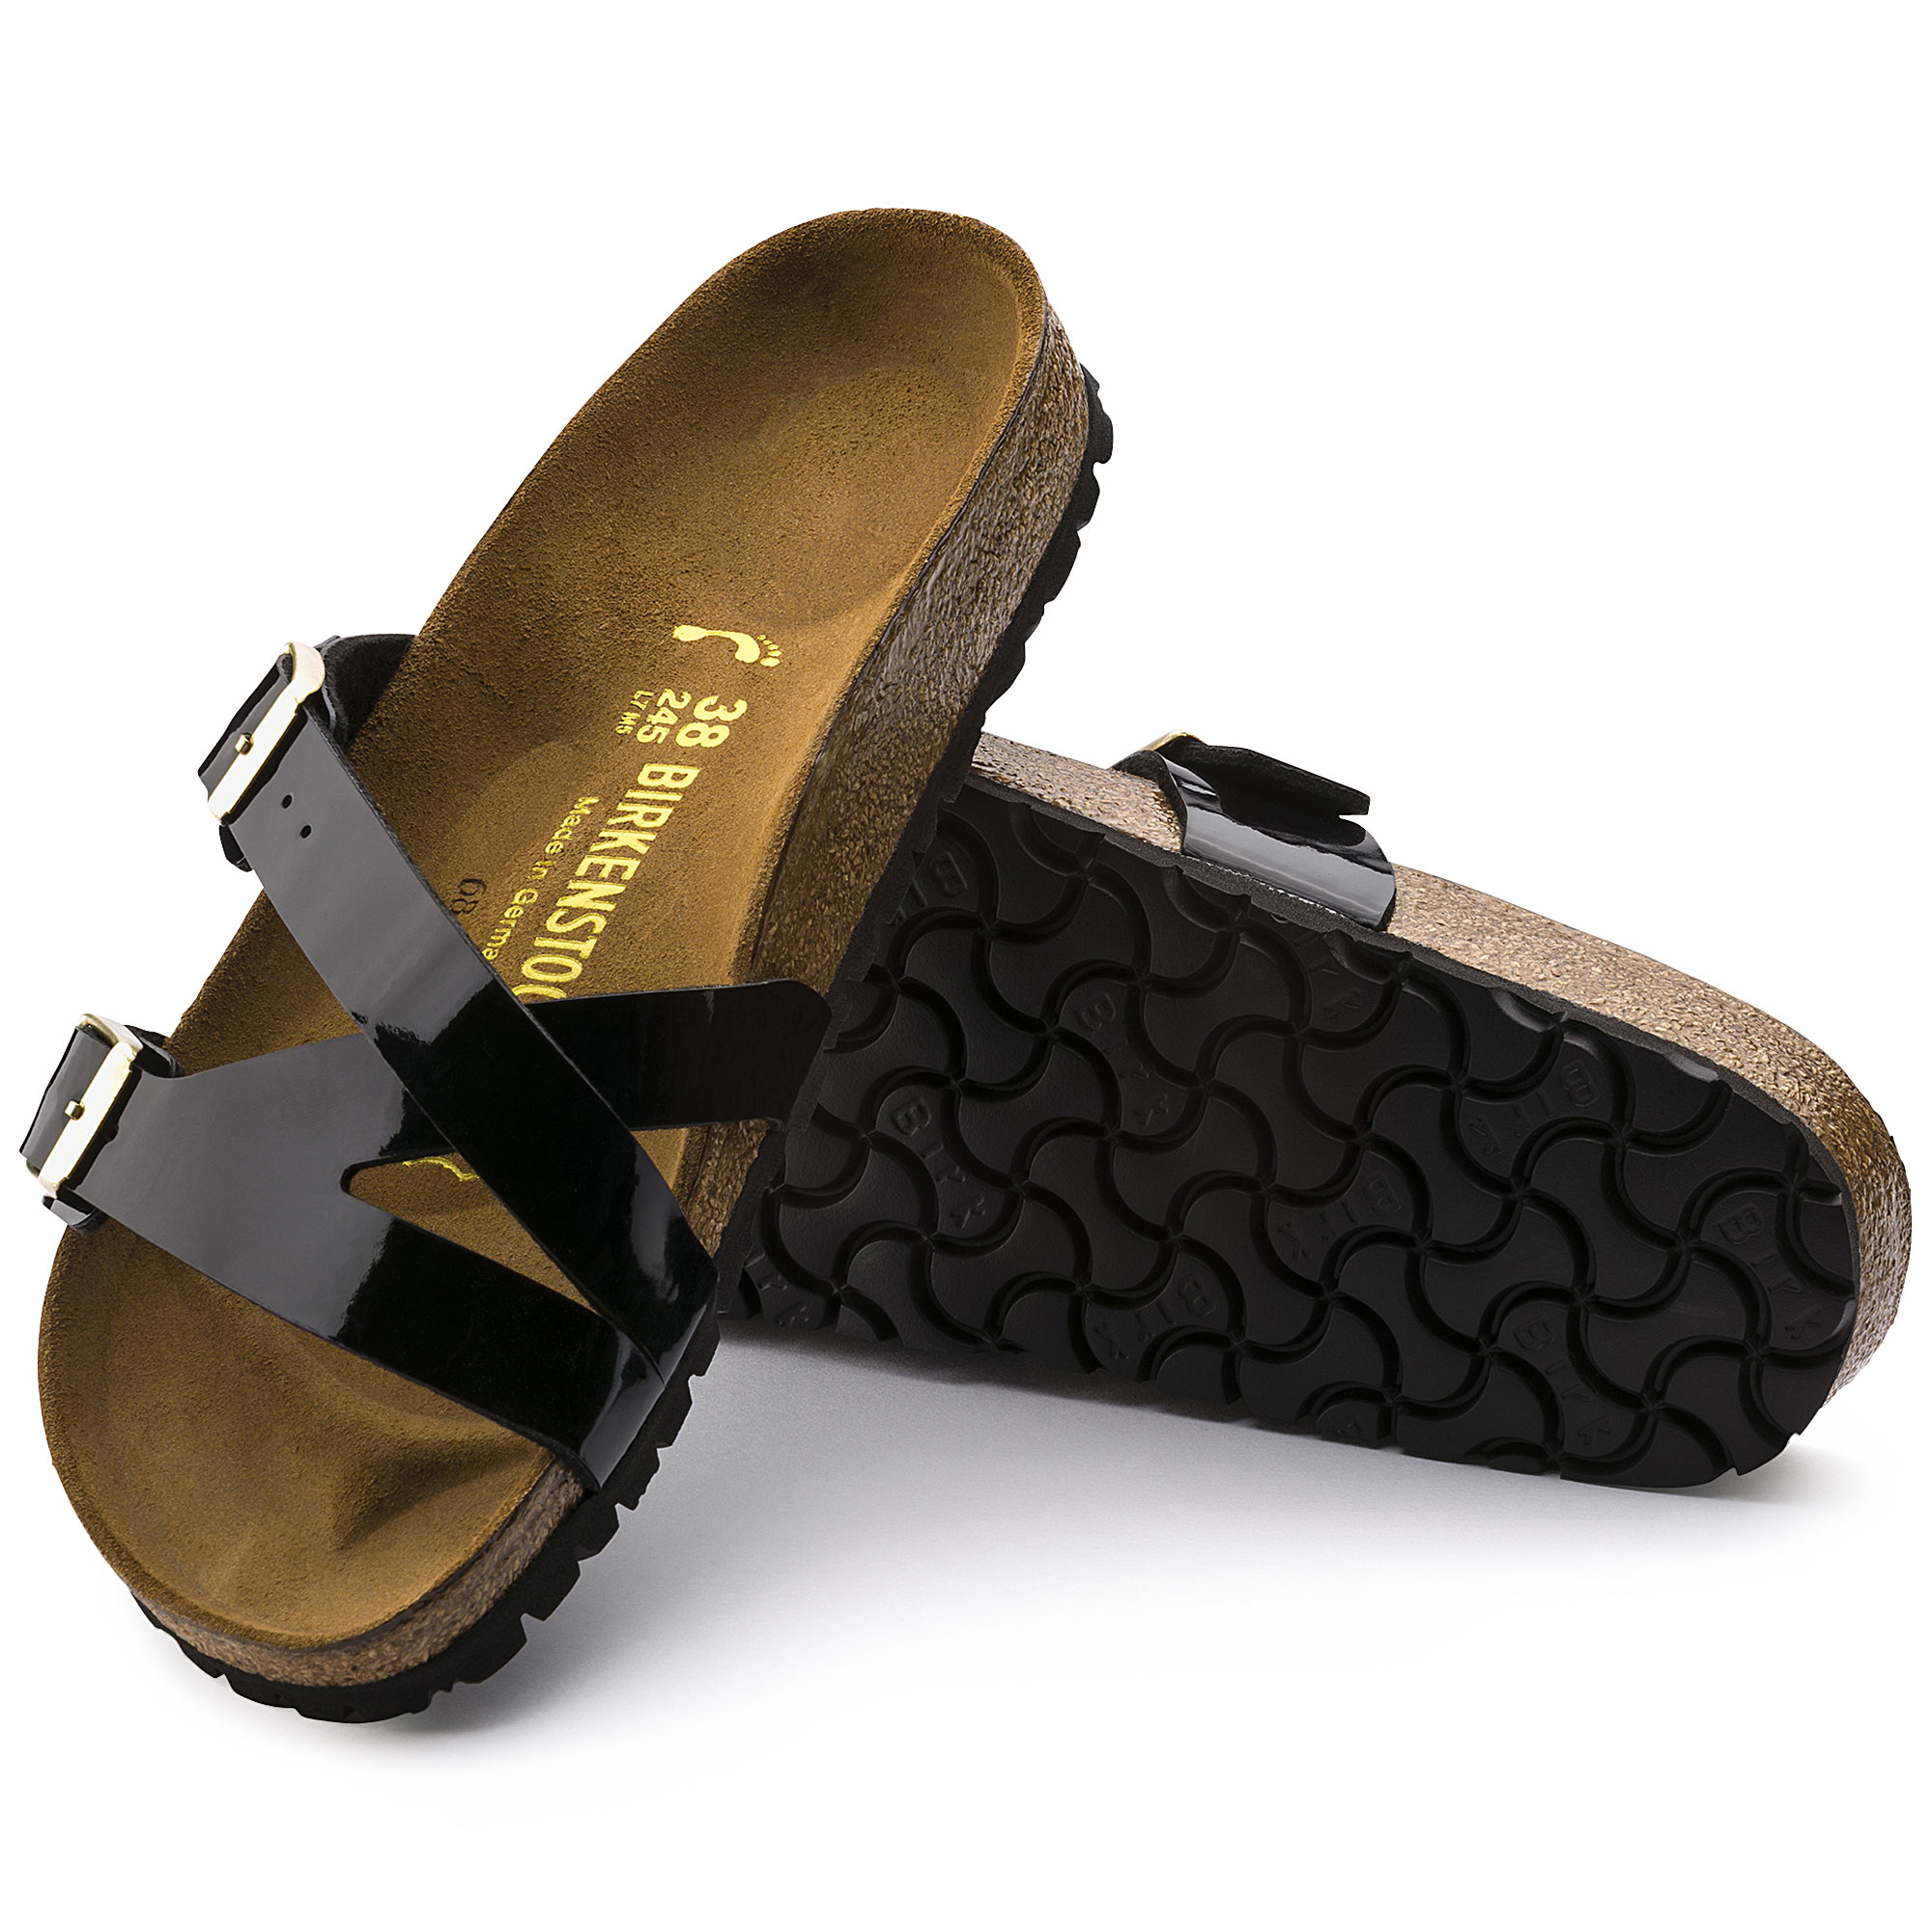 Yao Birko-Flor Black Patent | shop